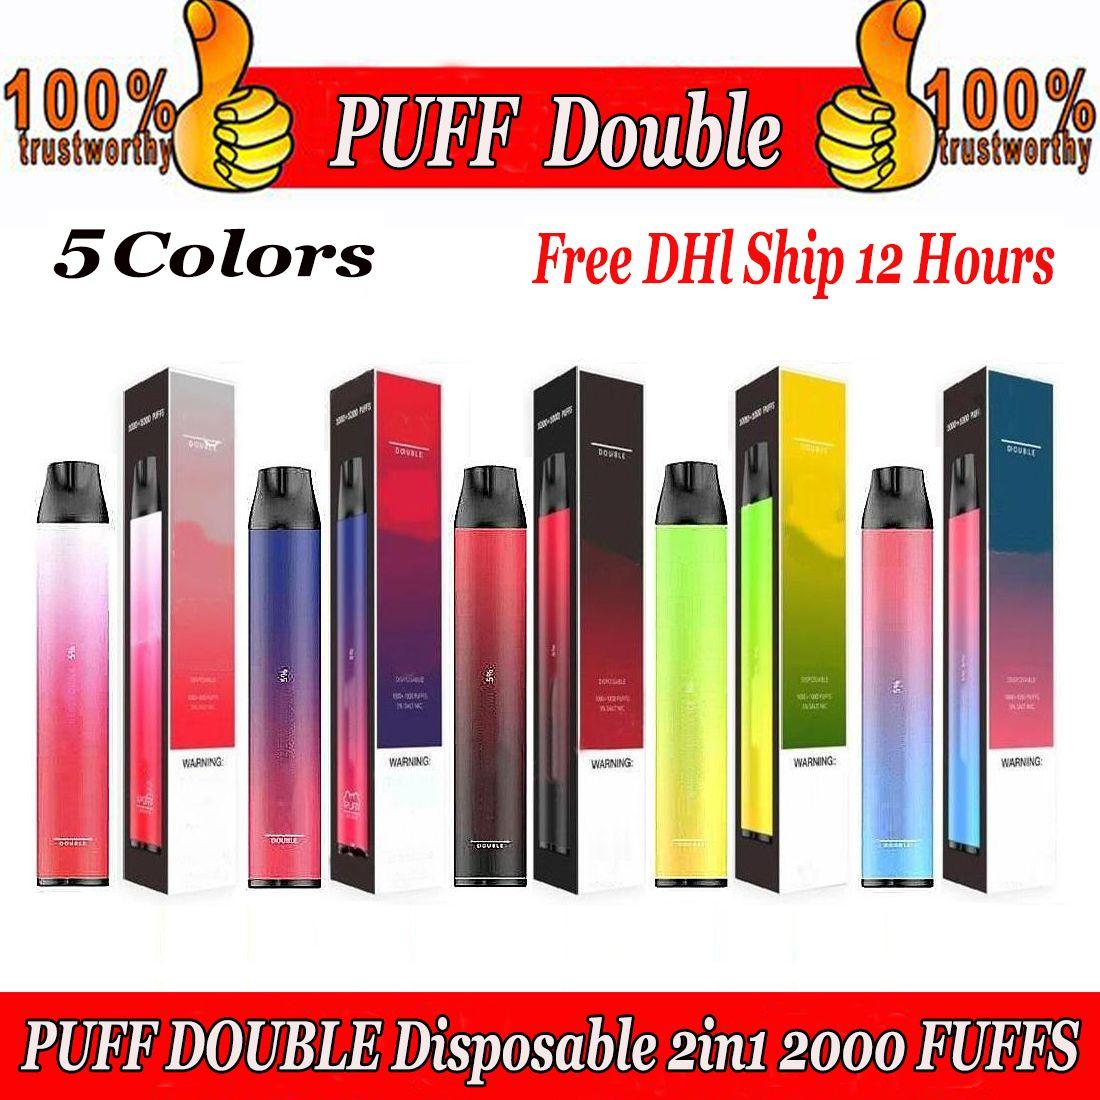 Neue Puff-Doppel-Einweg-2in1-Pod 2000Puffs-Patrone 900mAh-Batterie 6.0ml VAPE-Pods tragbarer Verdampfer leeres Kit vs Puff Bar plus XXL